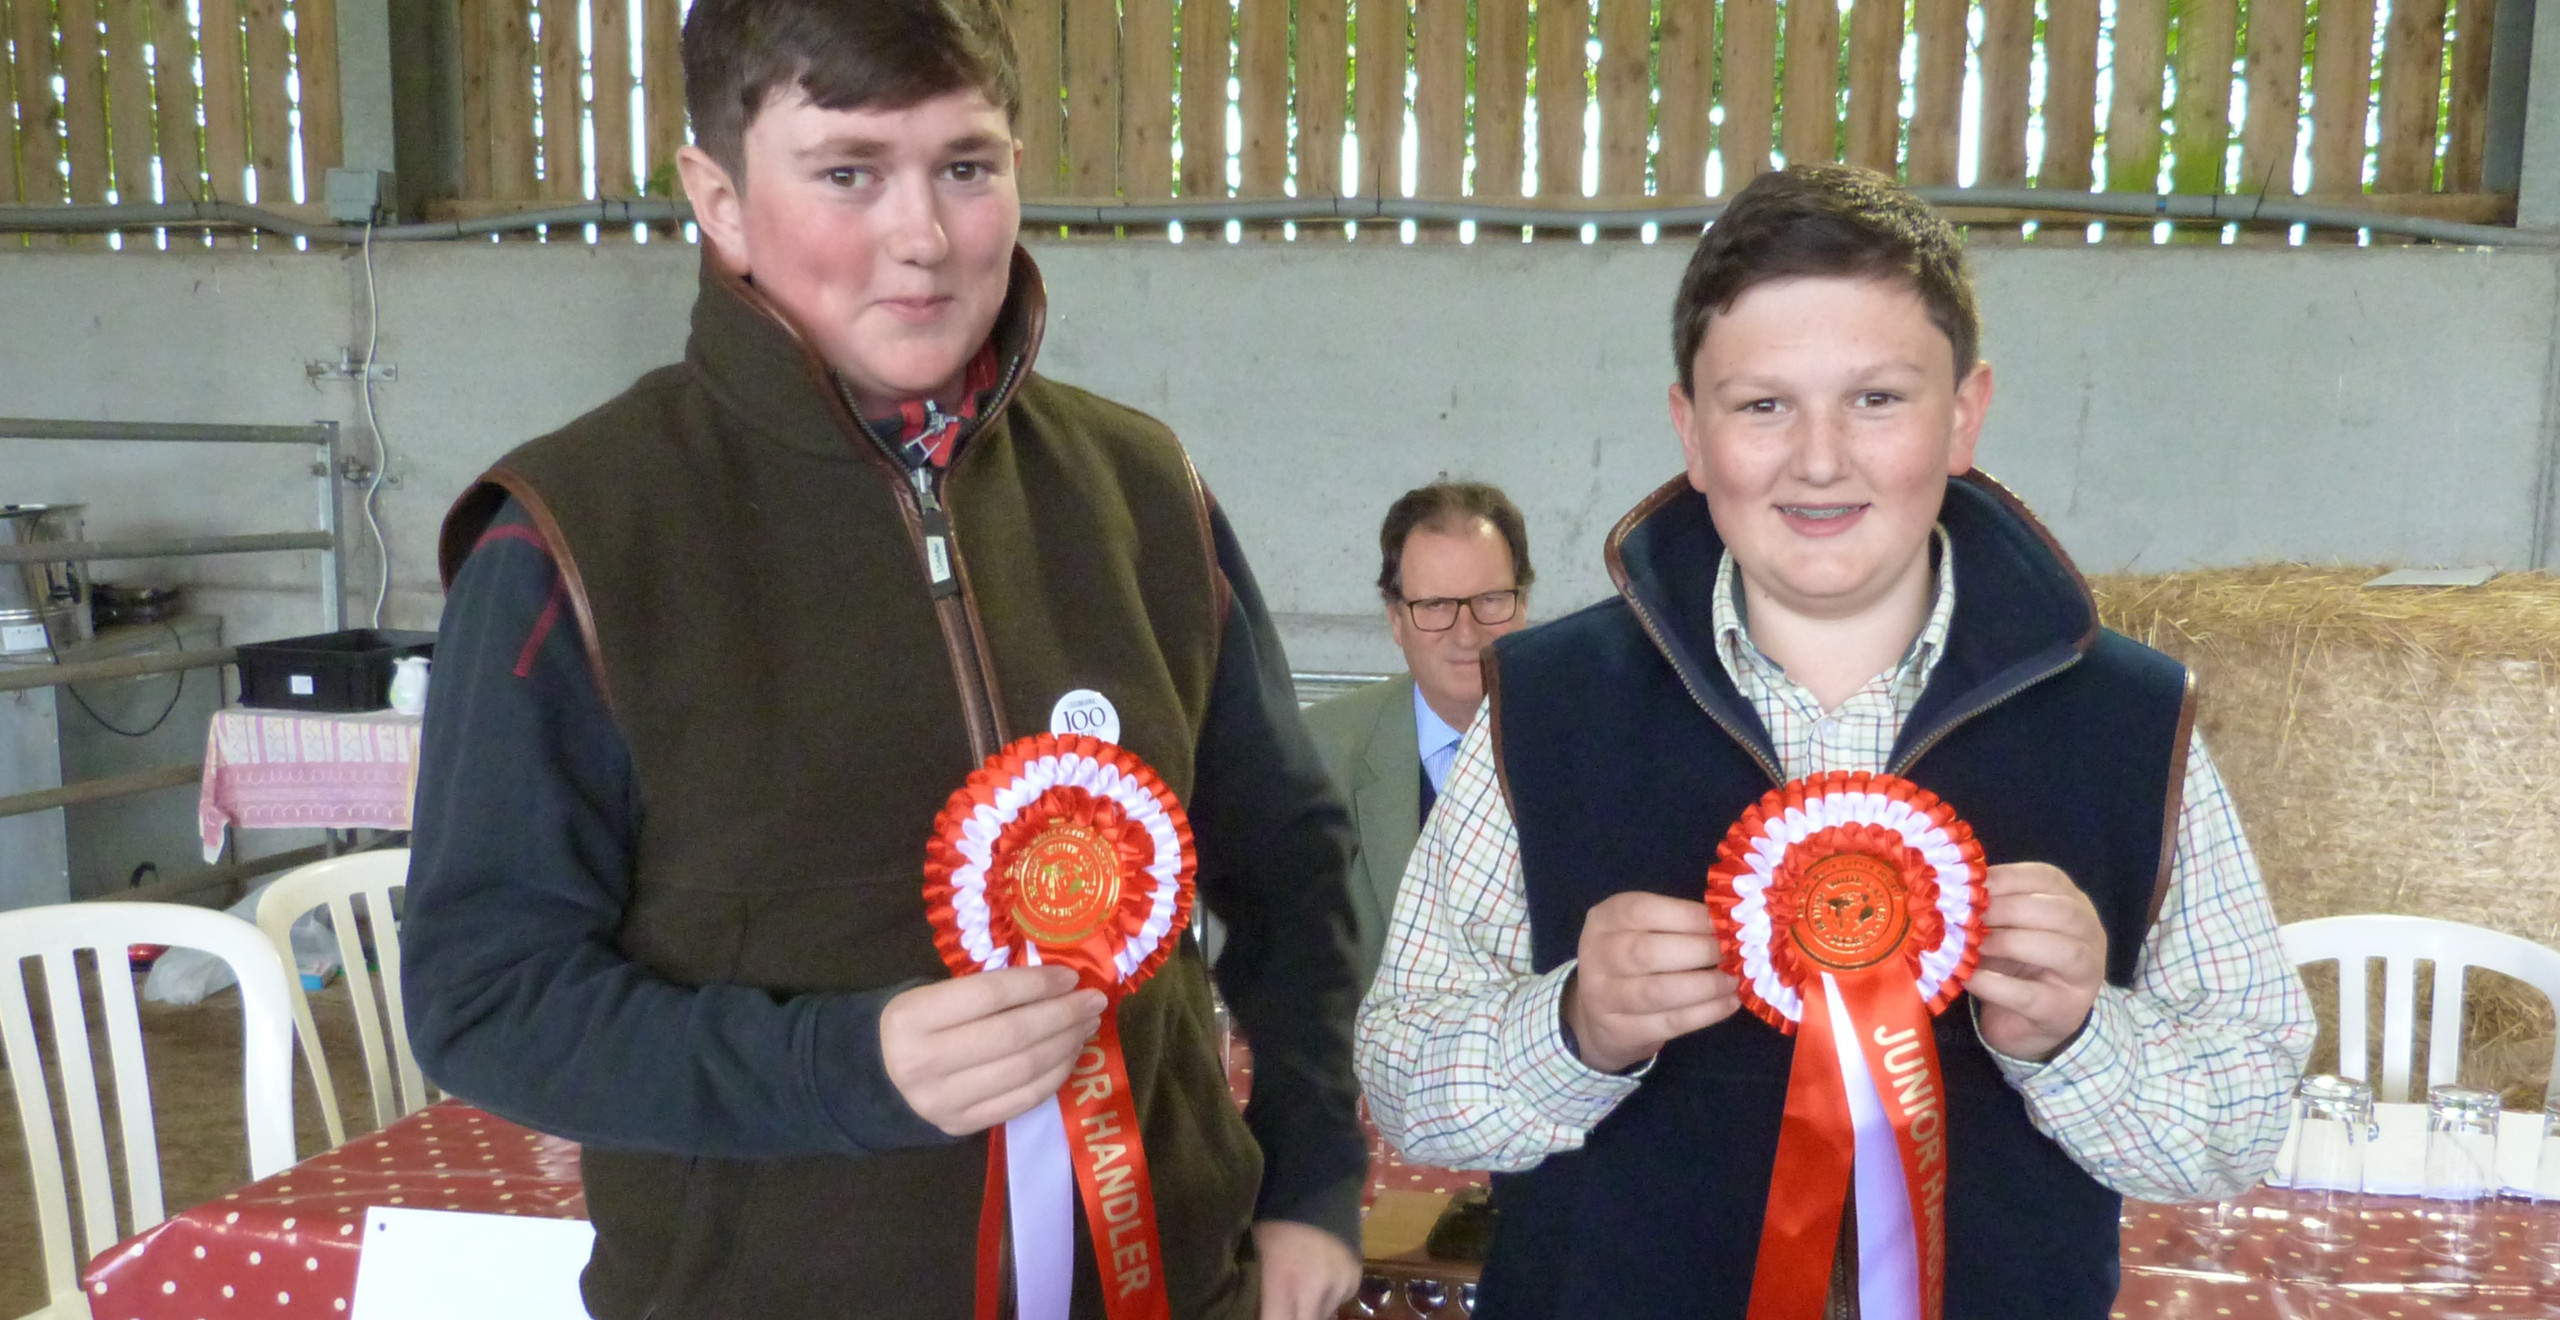 Harry and James Pennington collect their Junior Handler awards